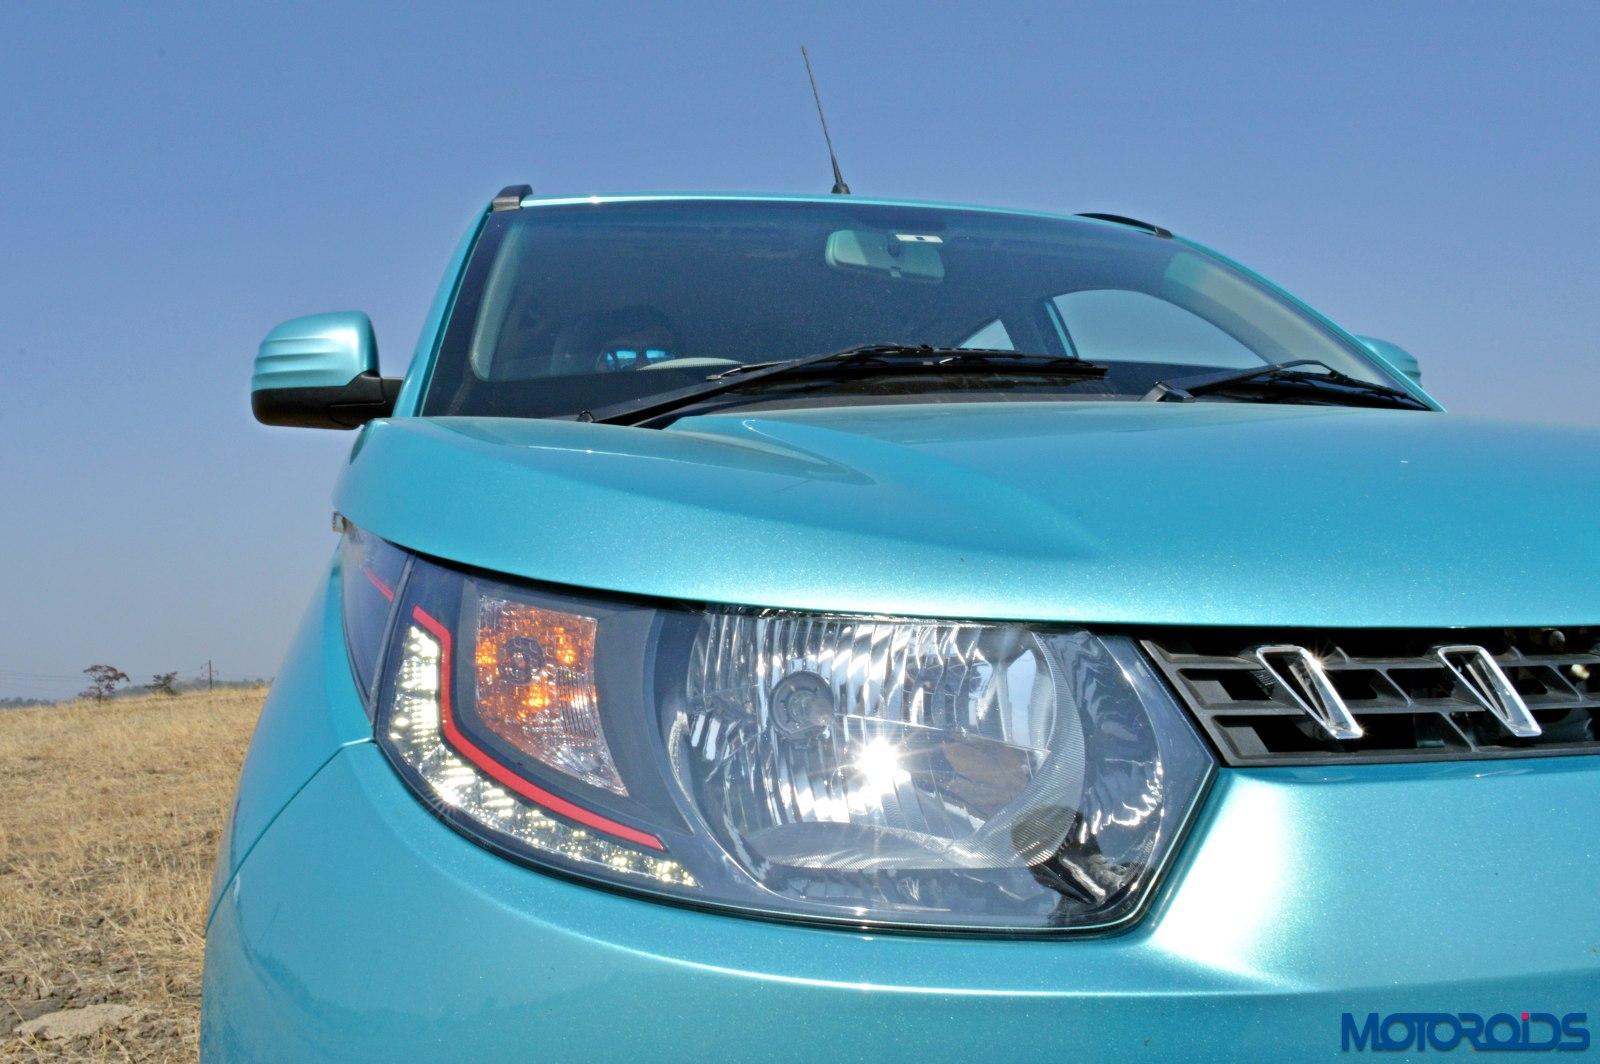 KUV 100 petrol review India headlight